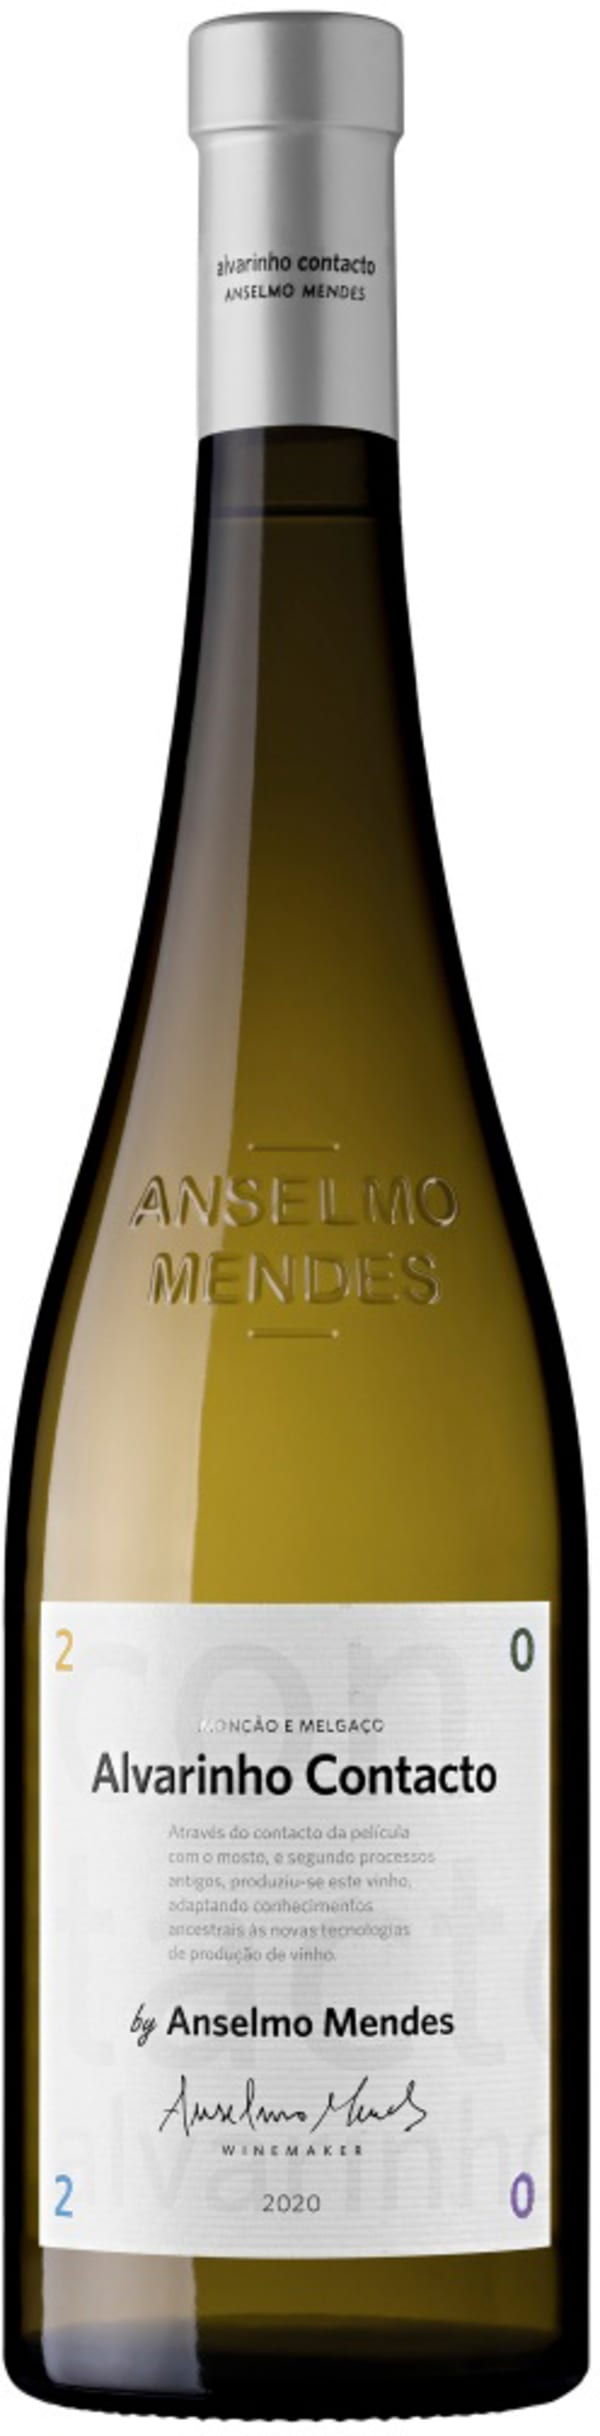 Anselmo Mendes Contacto Alvarinho 2017